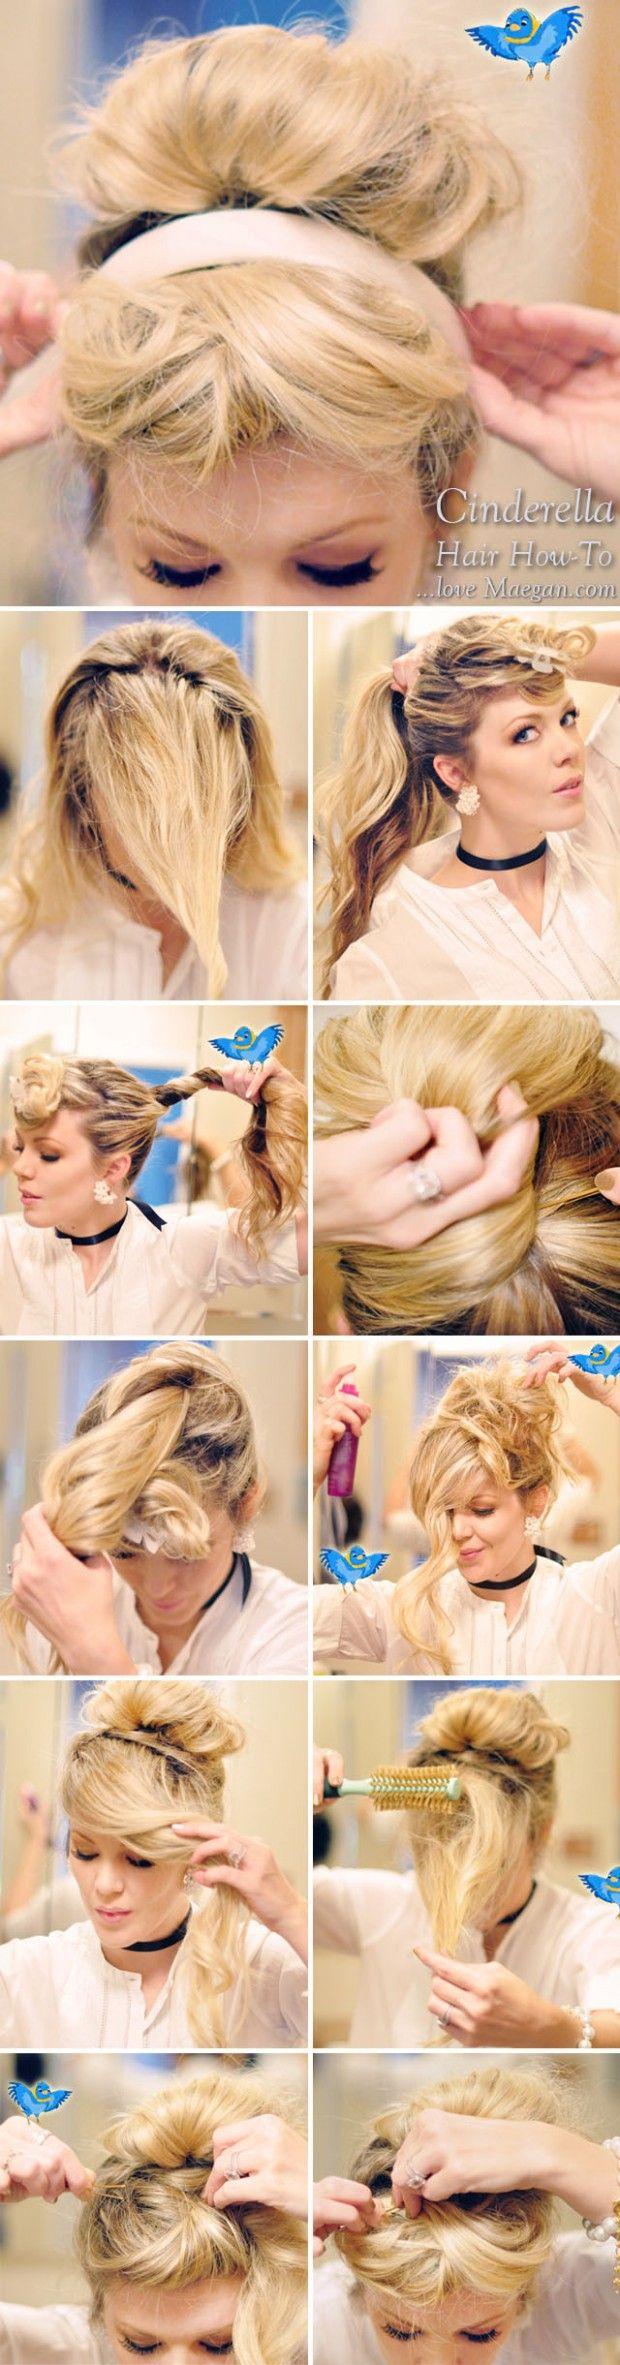 Howto cinderella hair u makeup photo tutorial love maegan